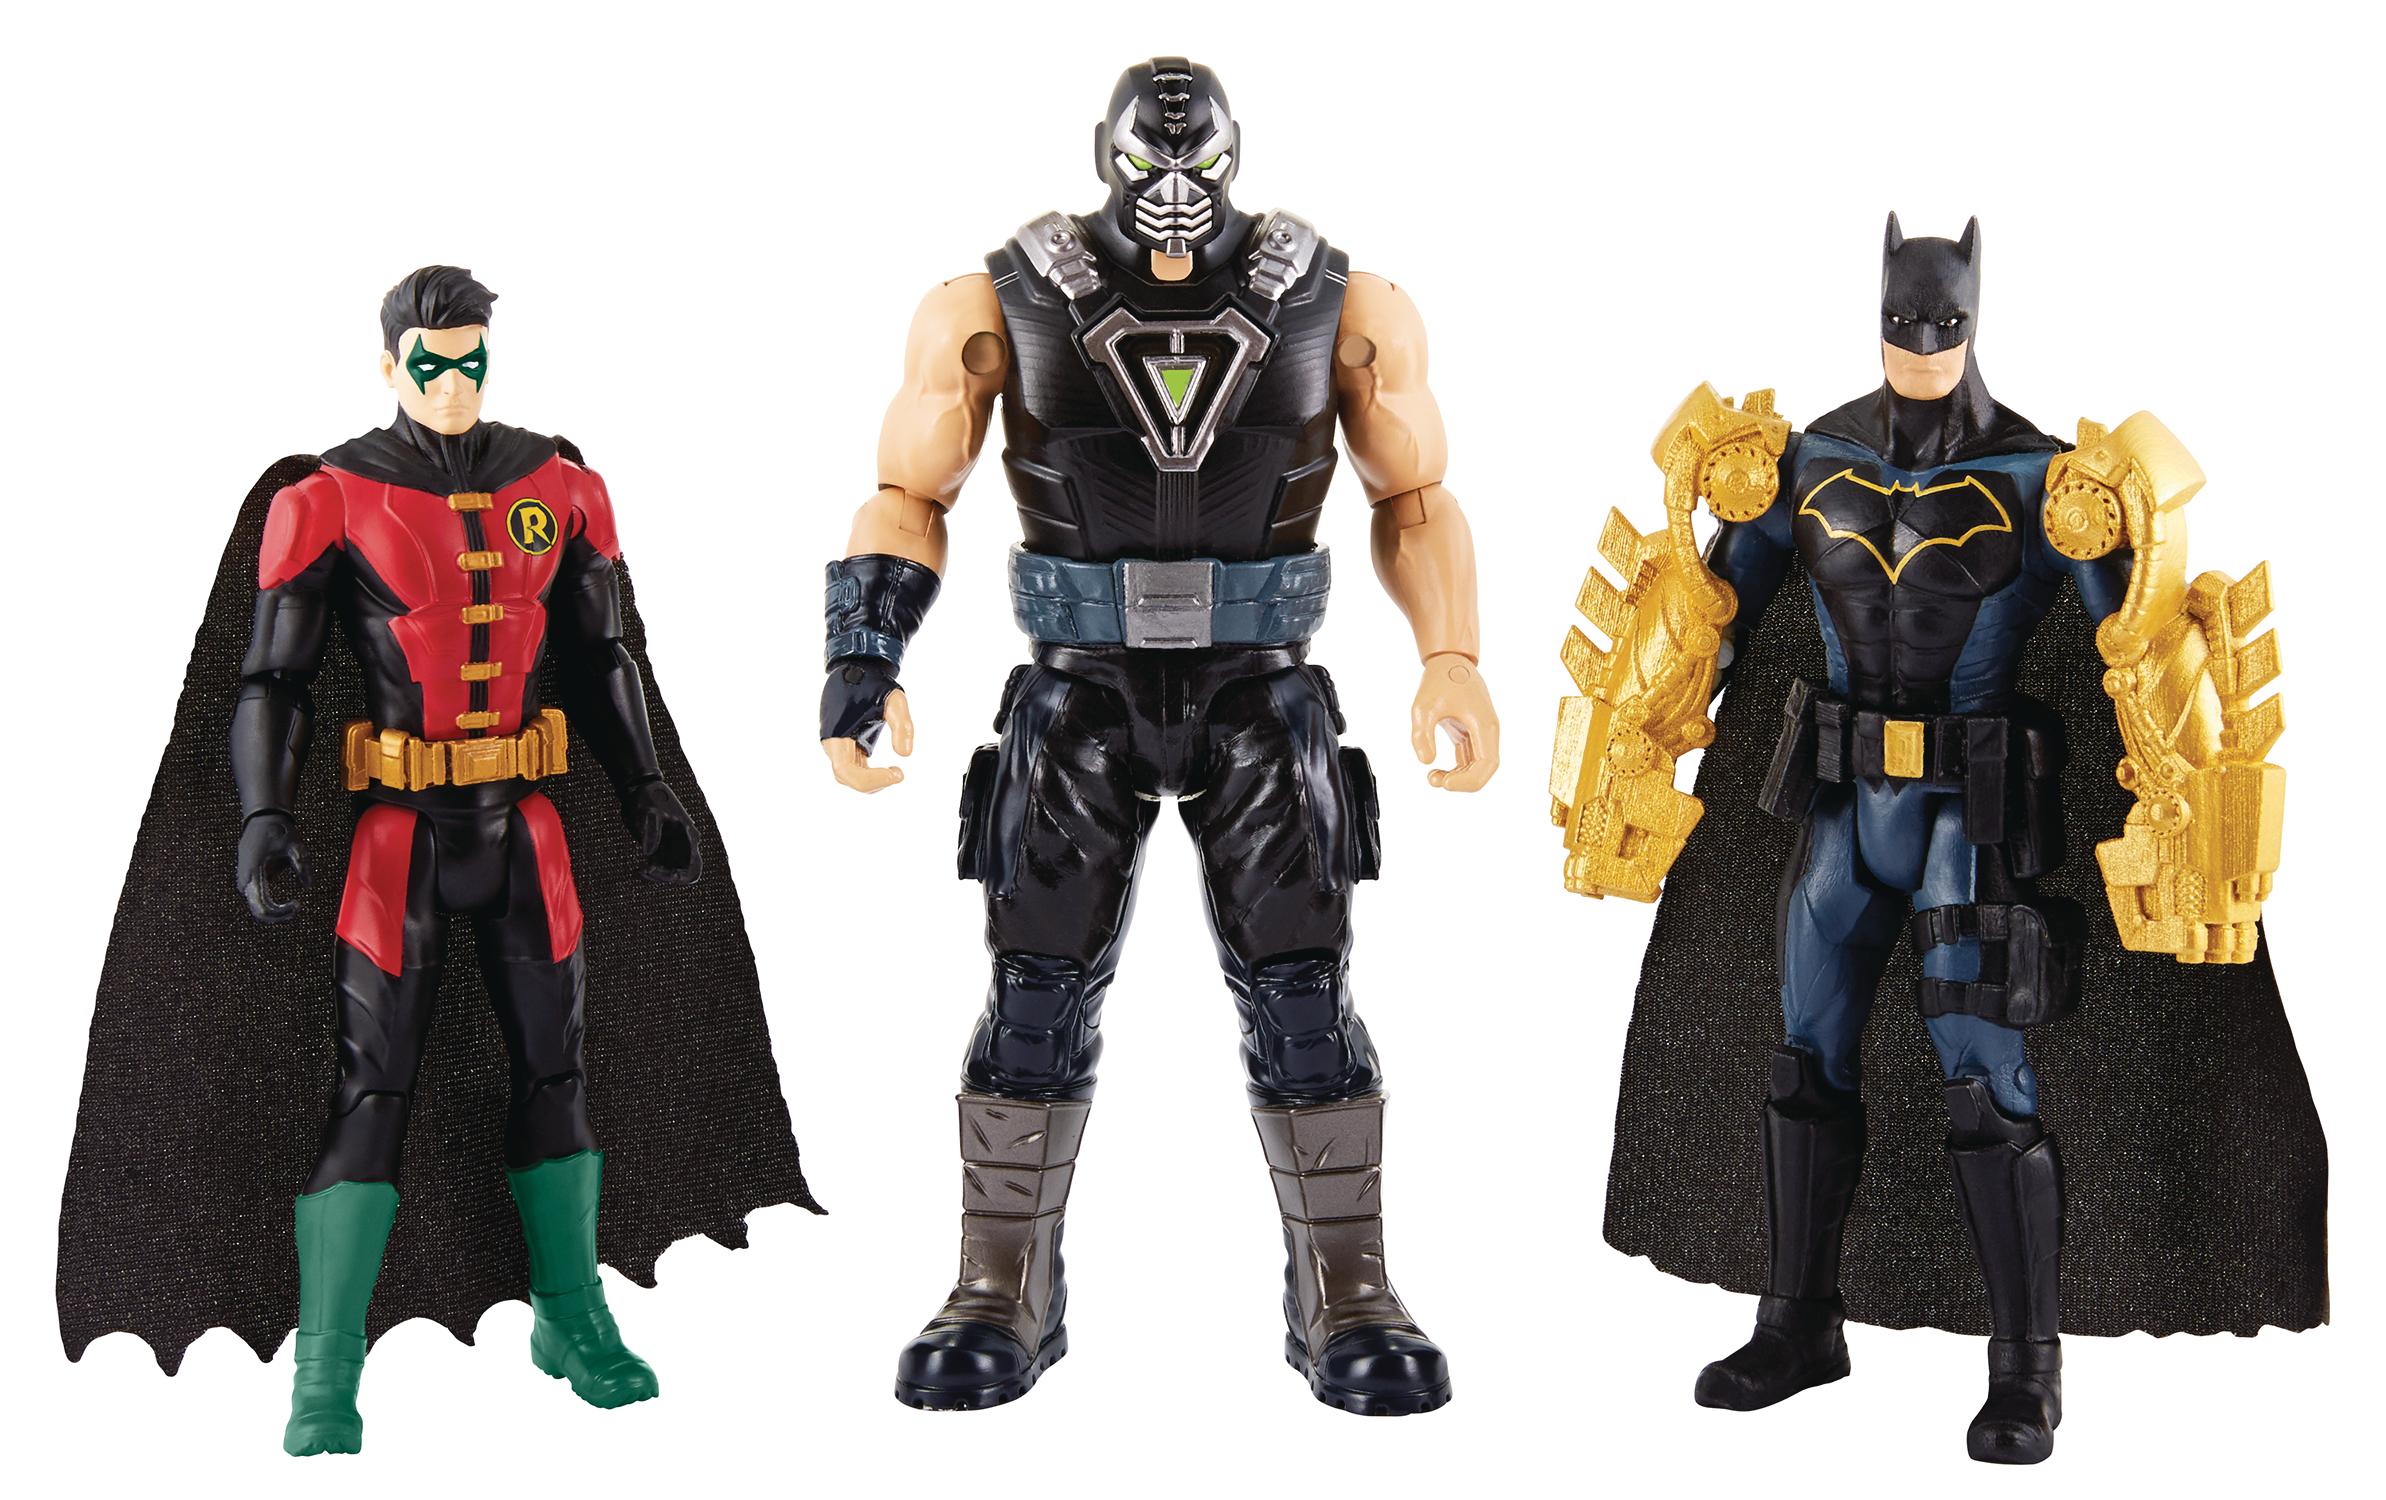 DC Comics Batman Missions 12-Inch Total Armor Batman Action Figure